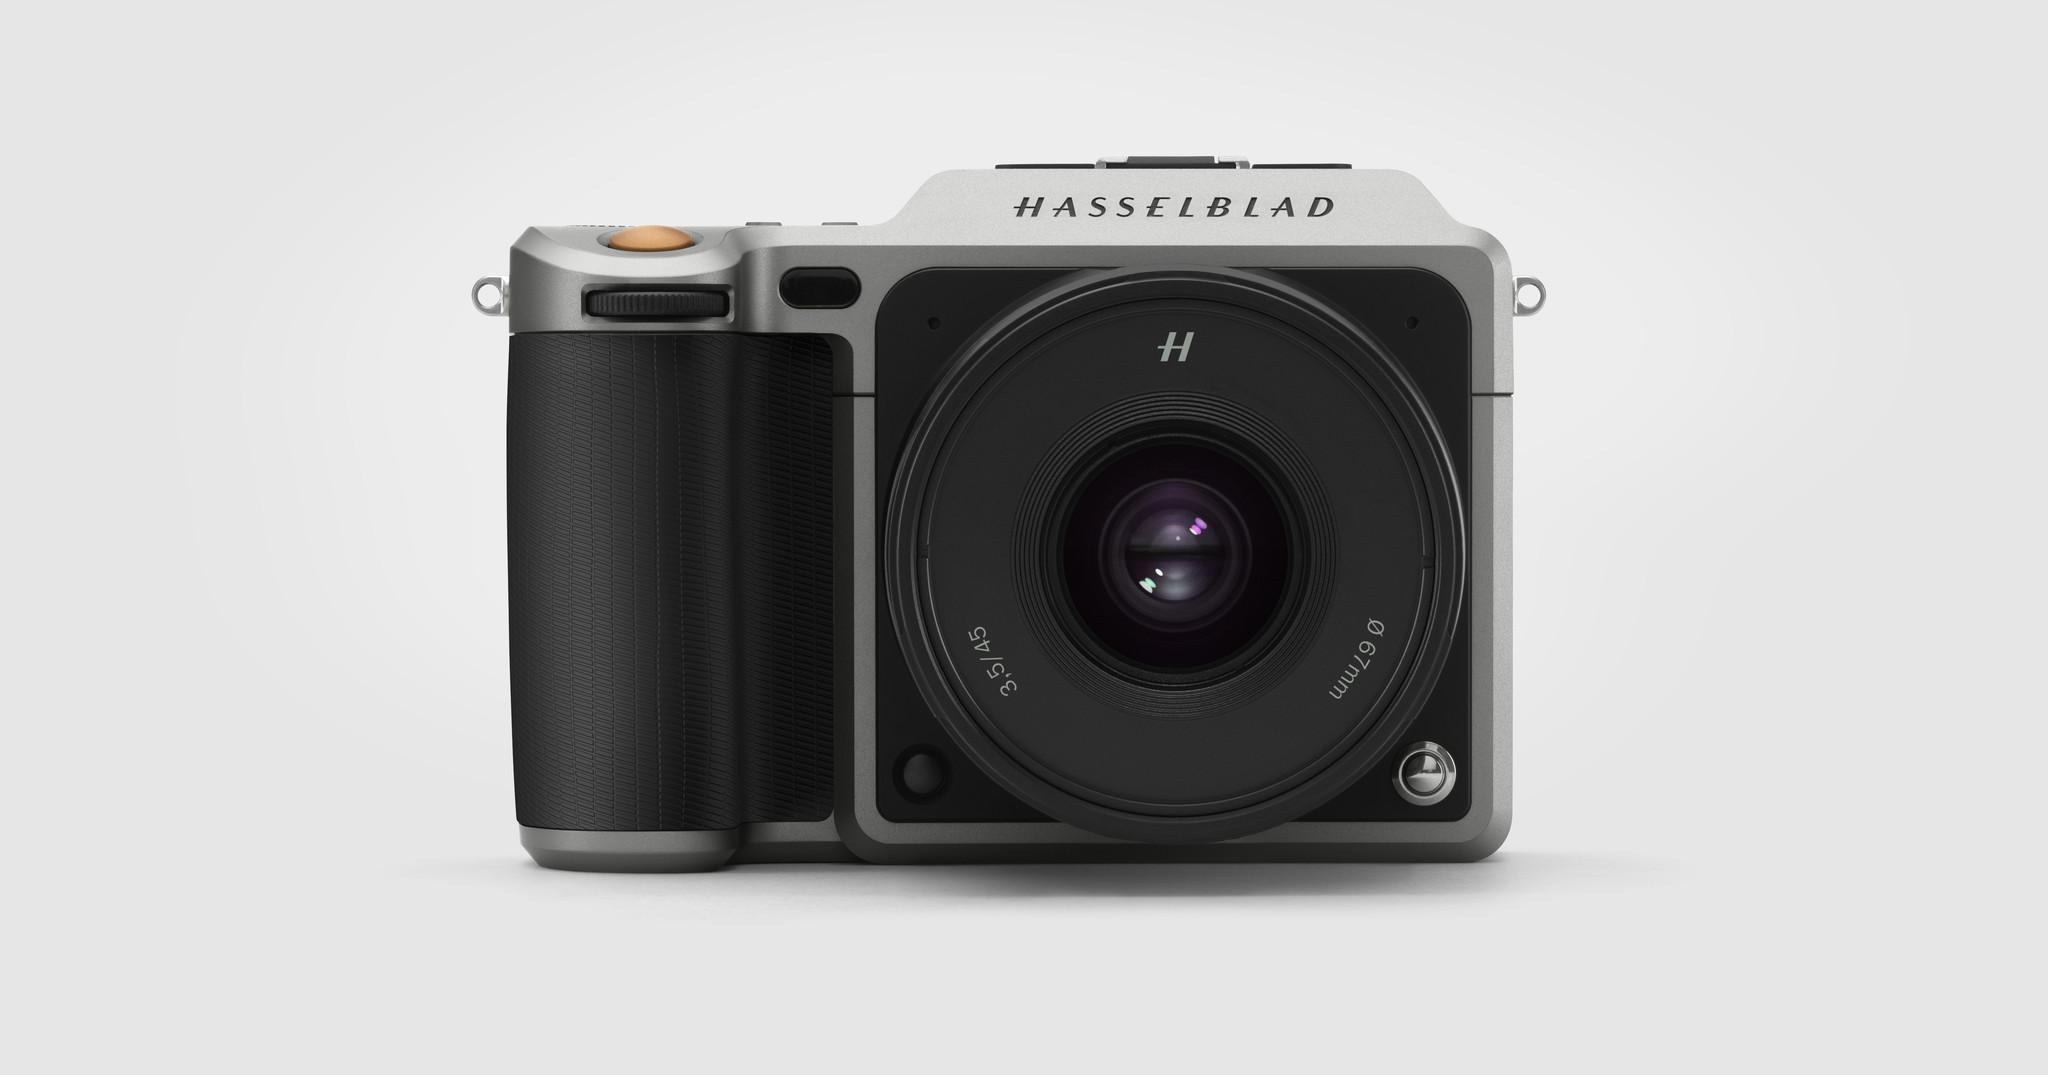 hasselblad x1d 50c review image